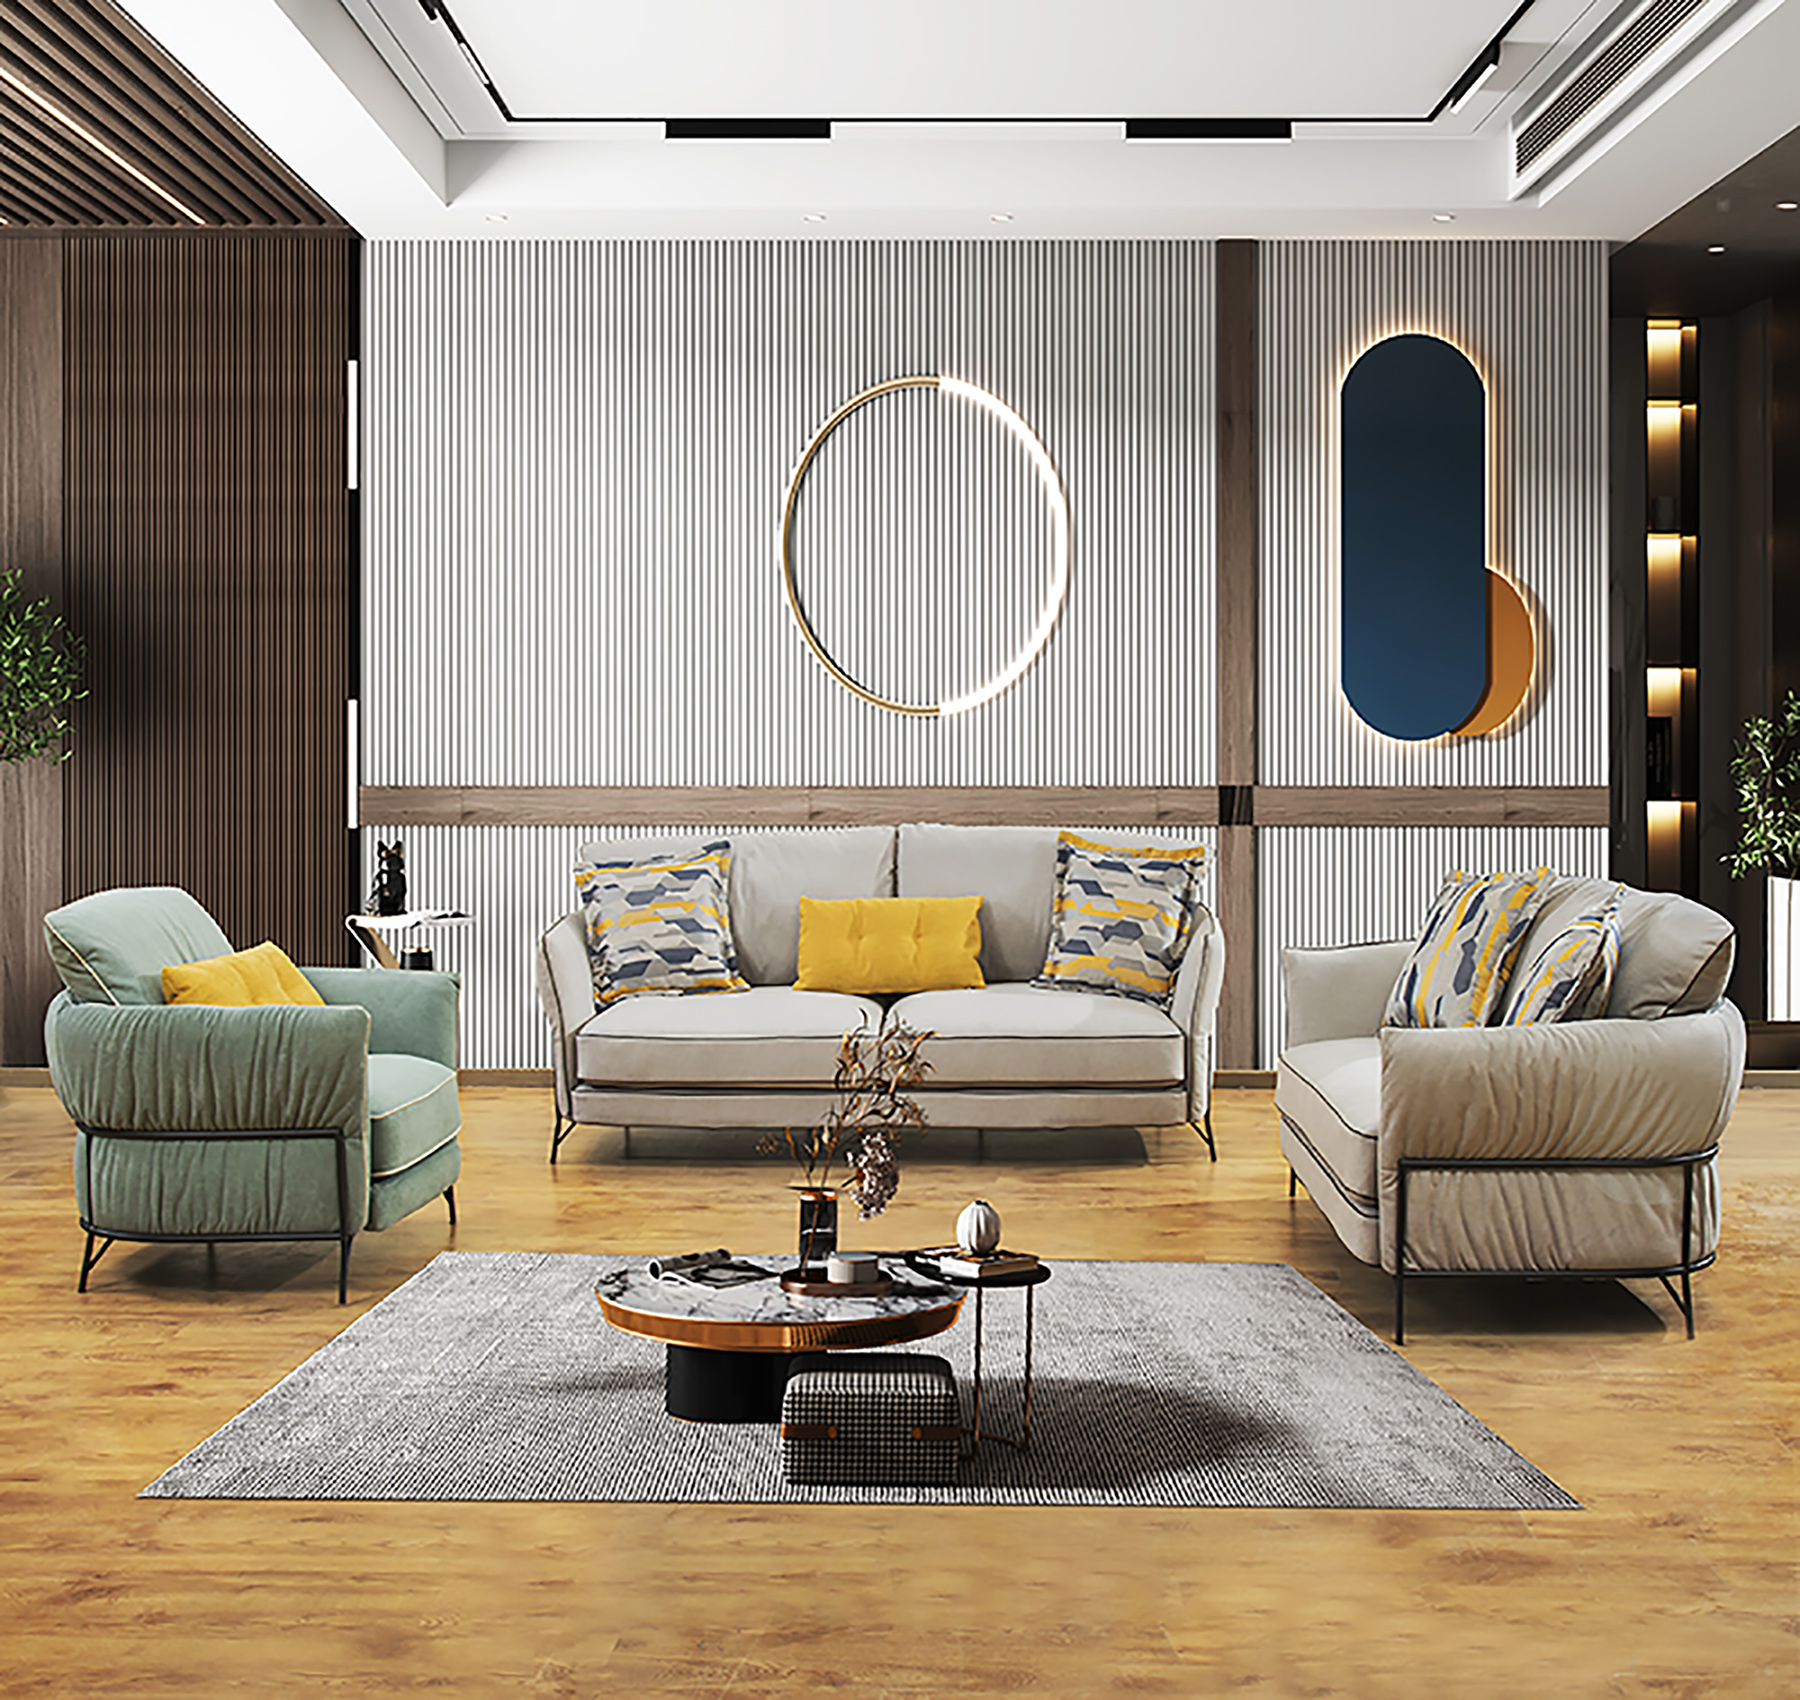 Advantages and disadvantages of cloth fabric sofa